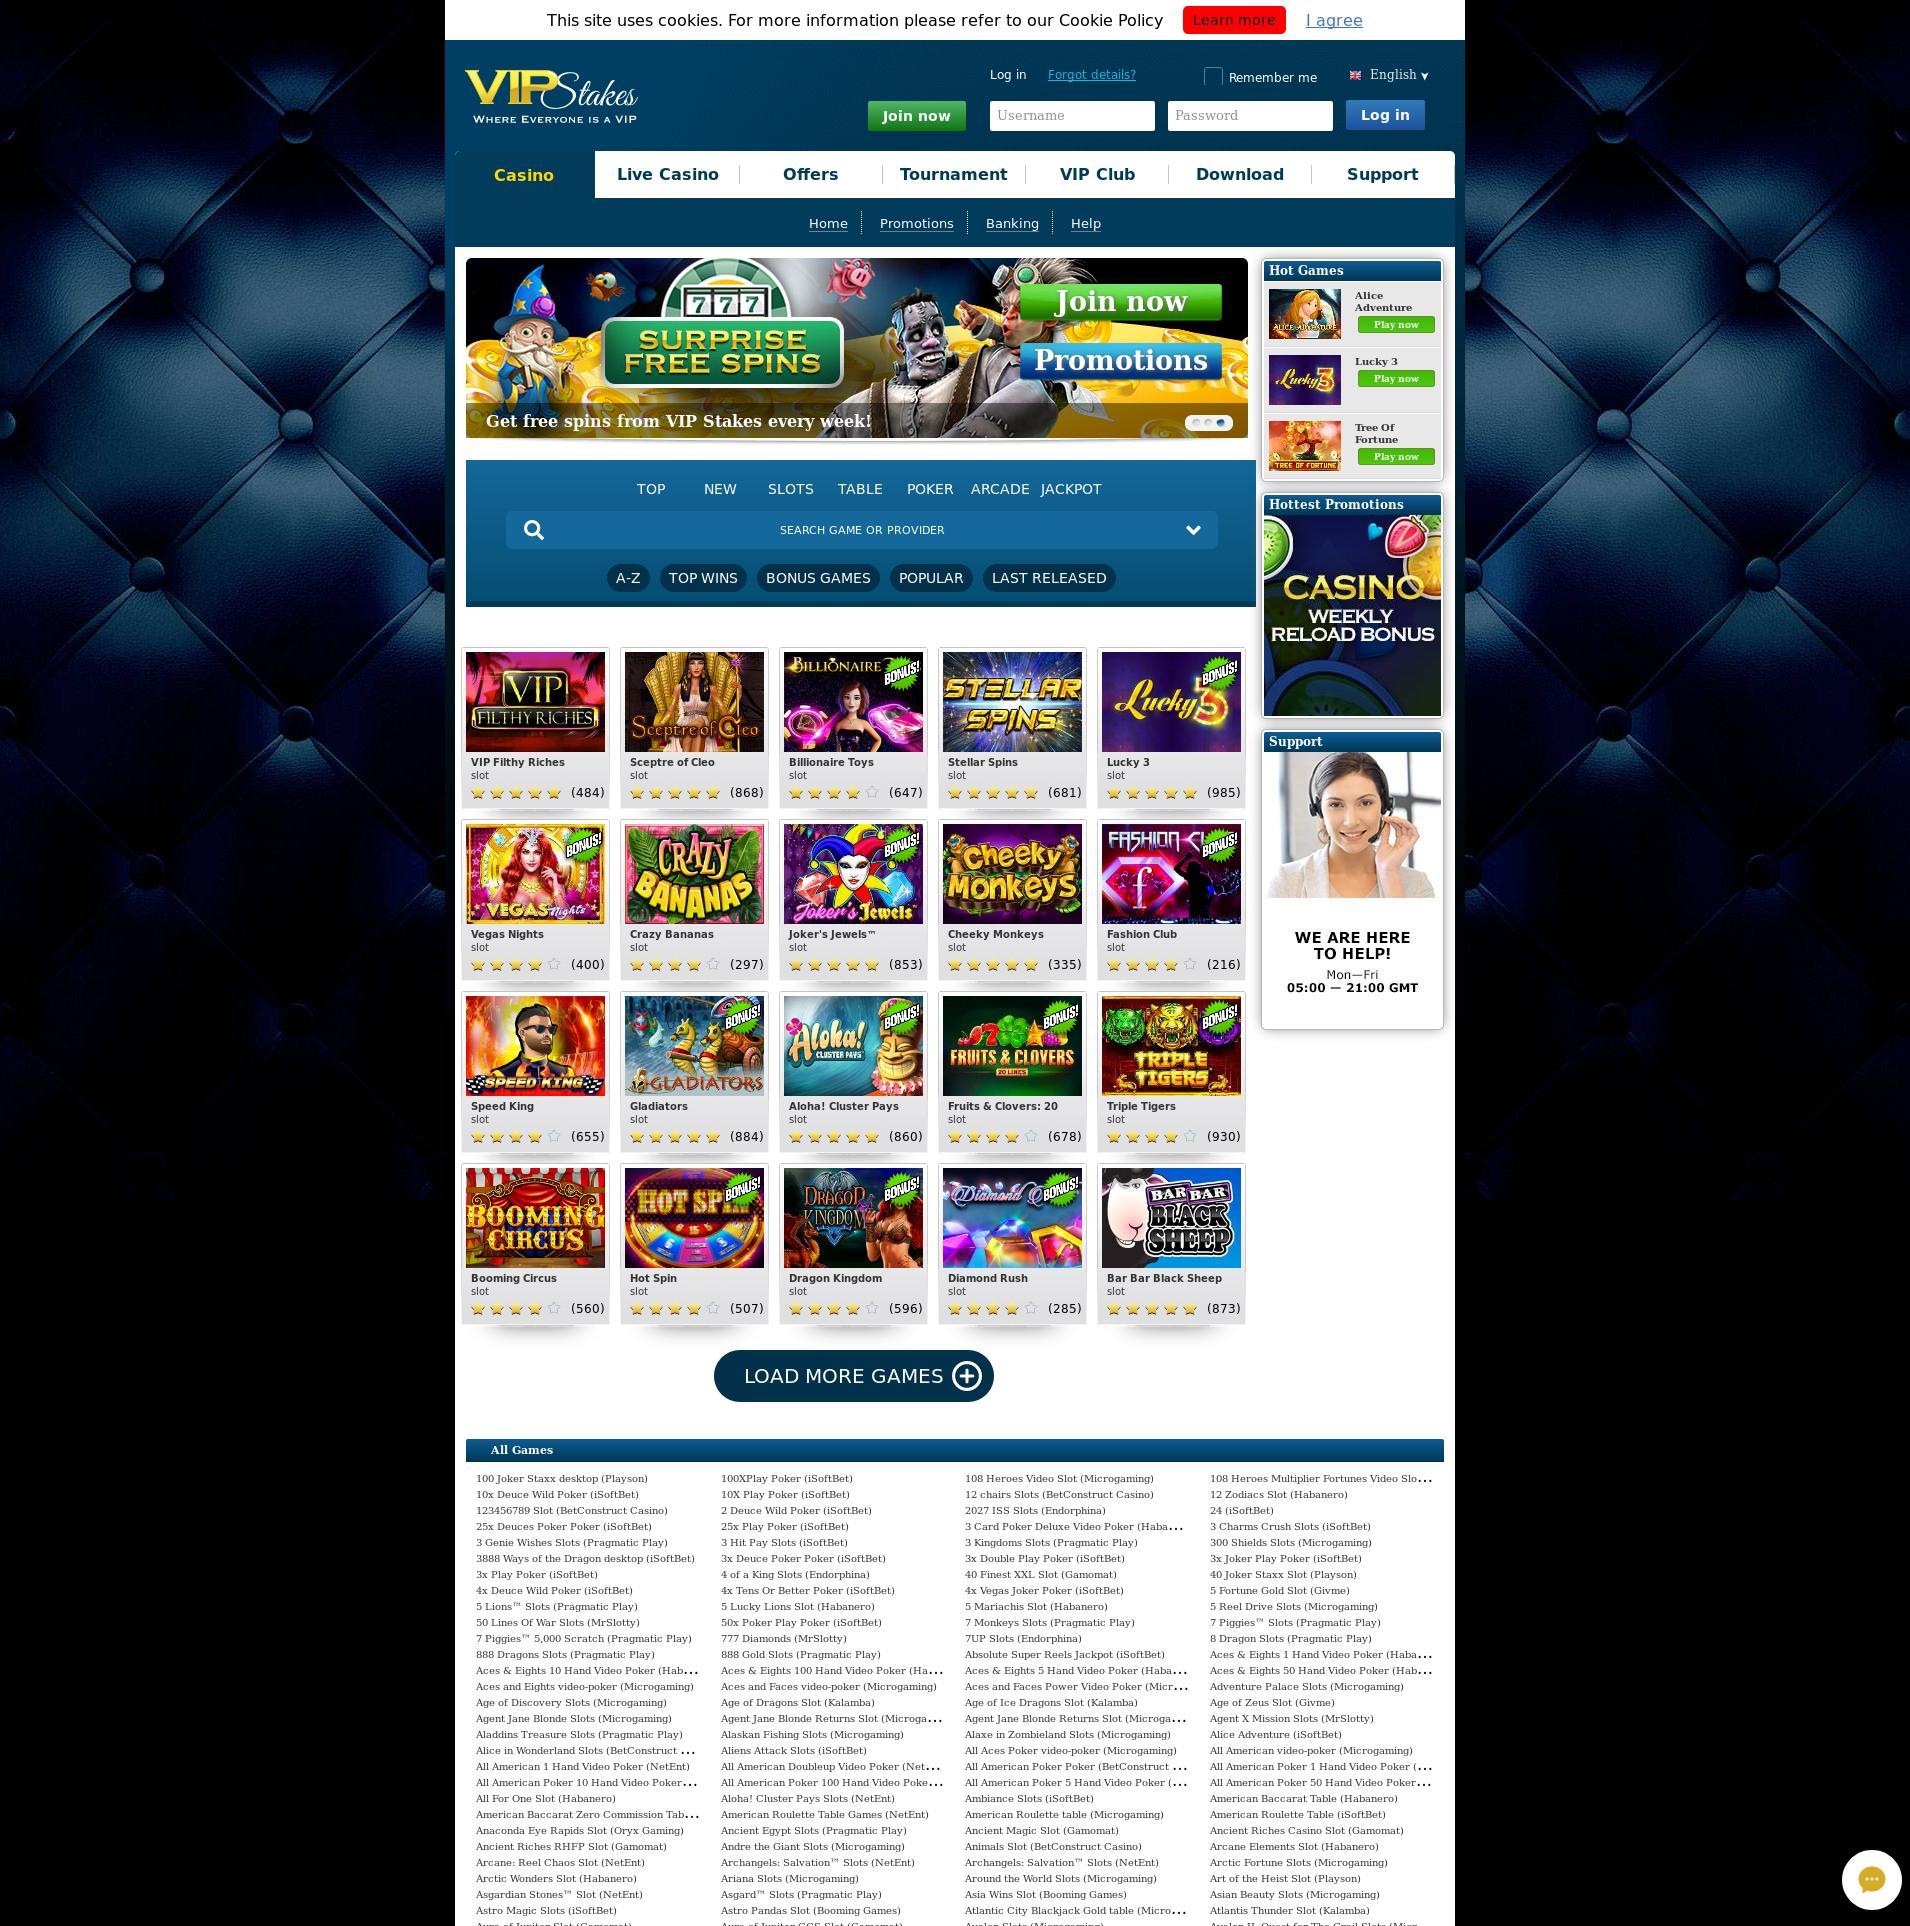 Casino screen Lobby 2019-08-25 for Germany